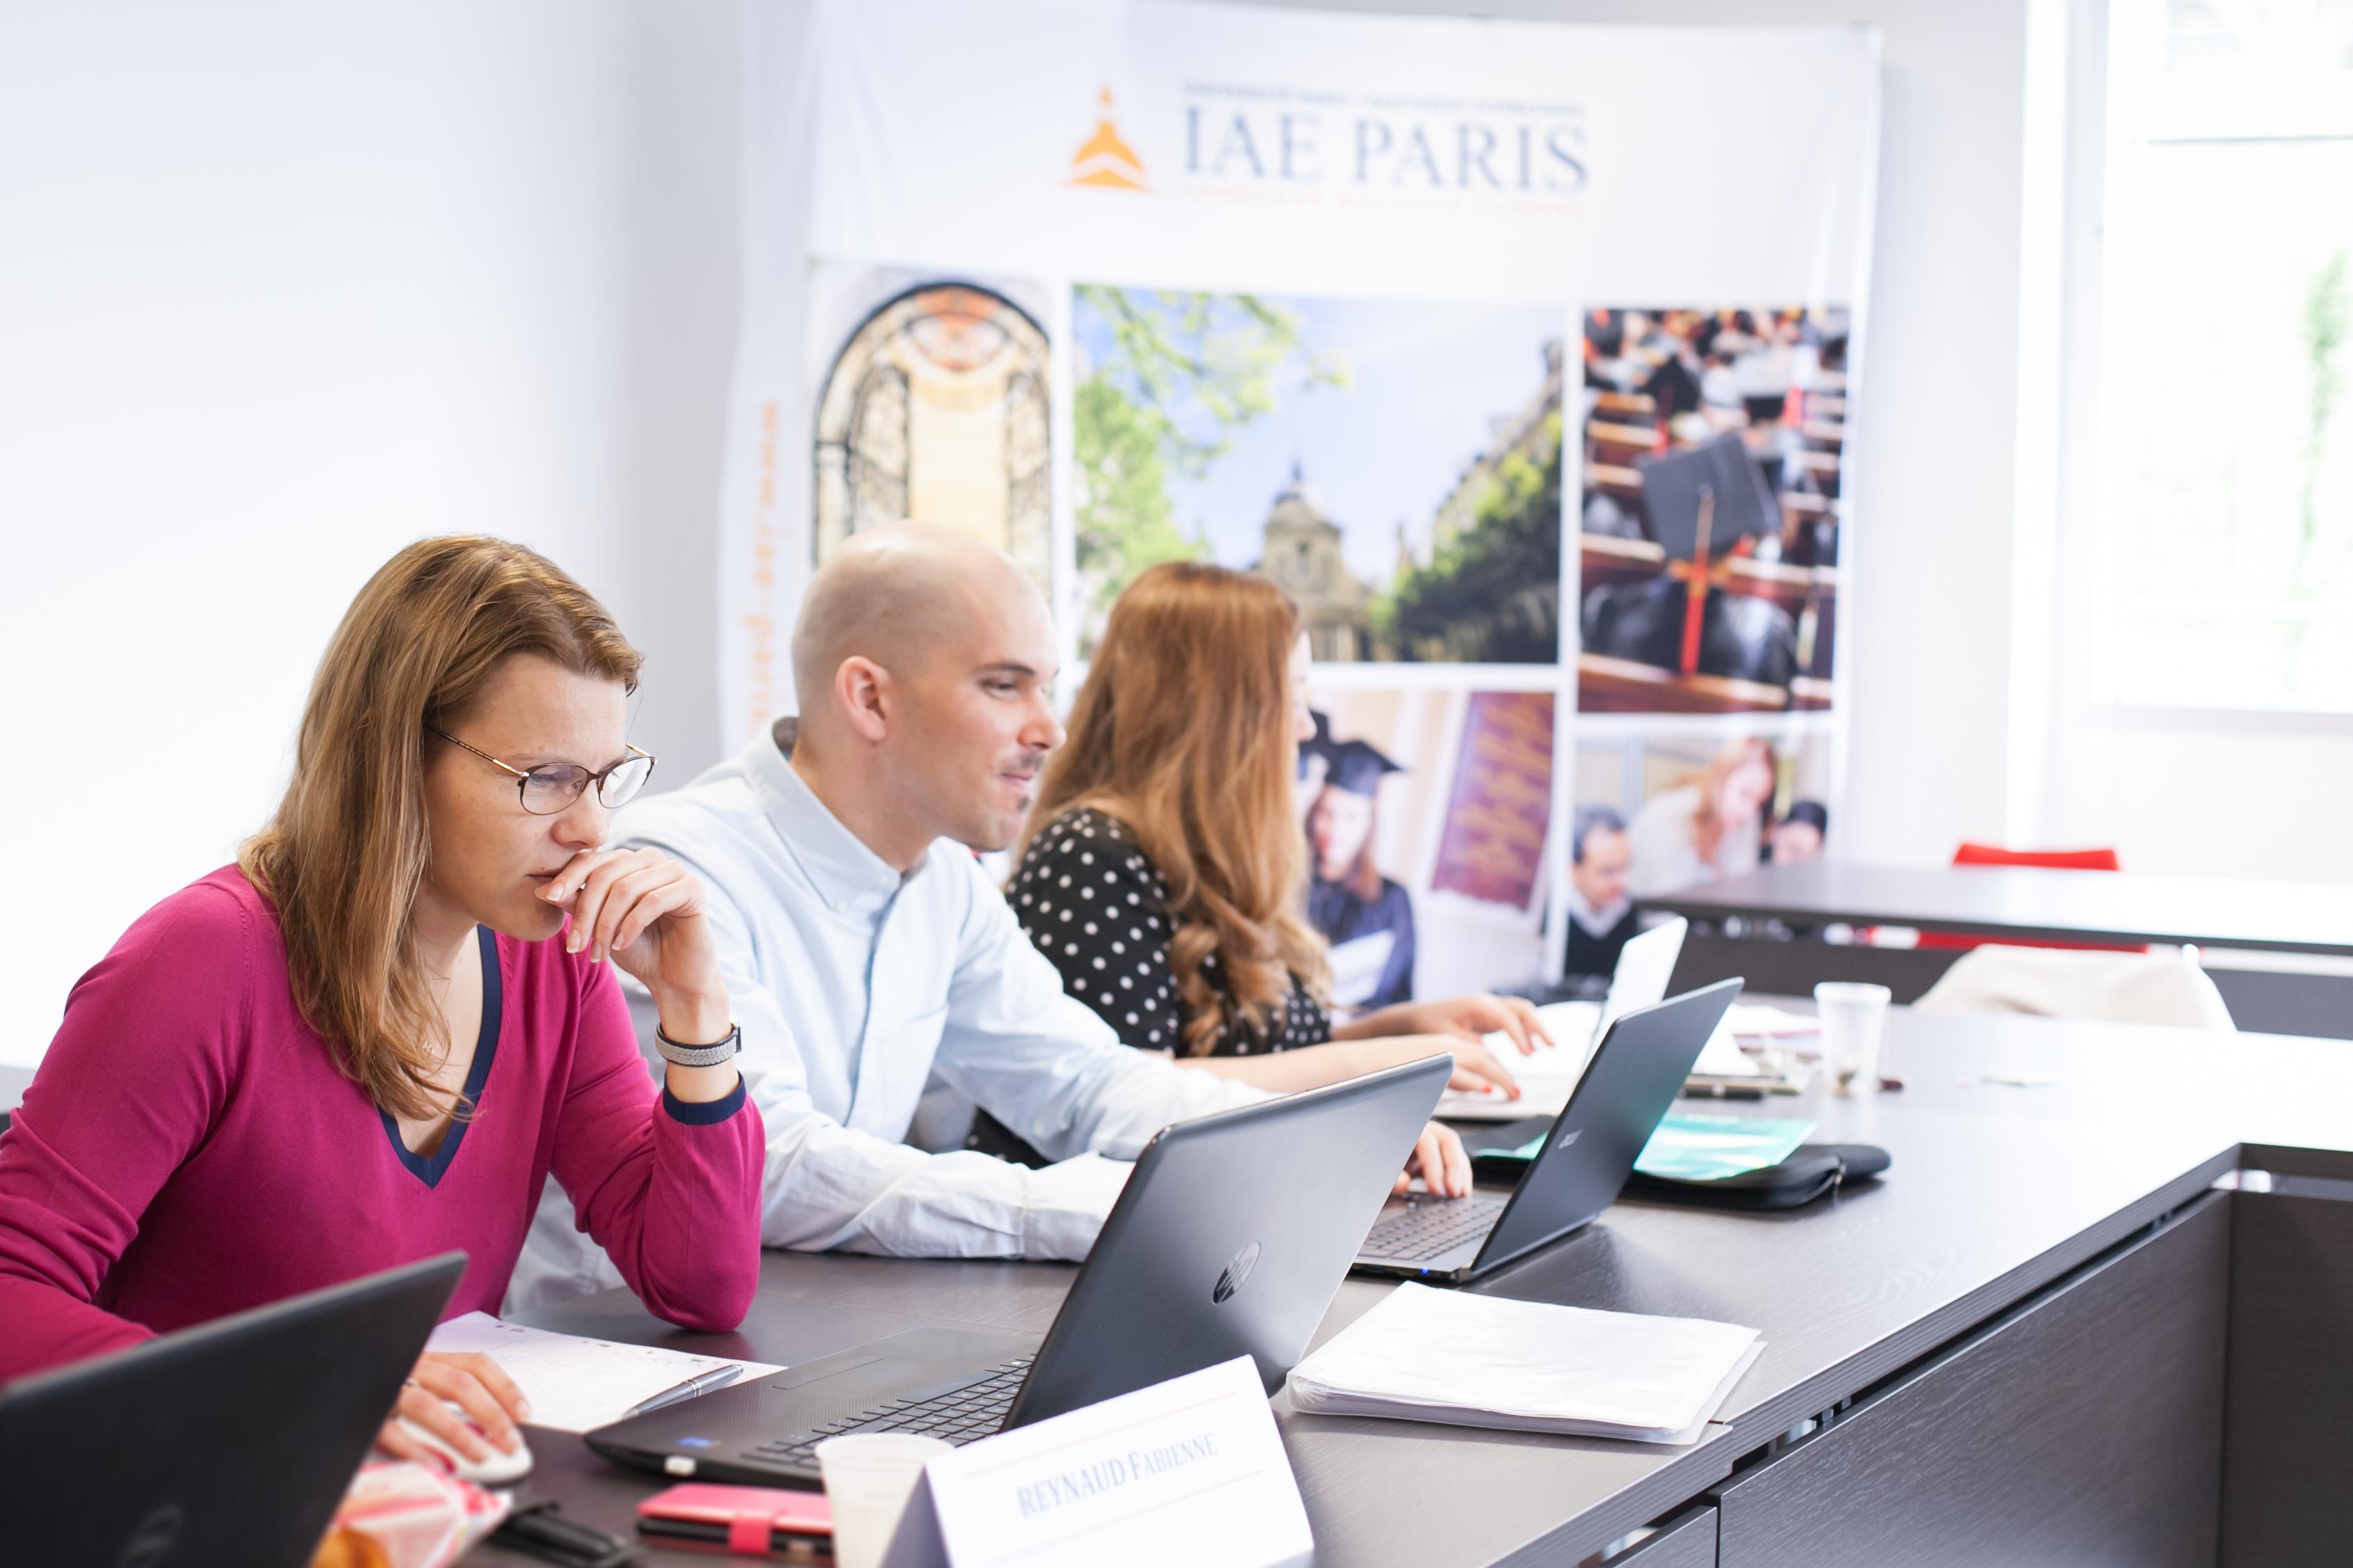 Etudiants © IAE Paris